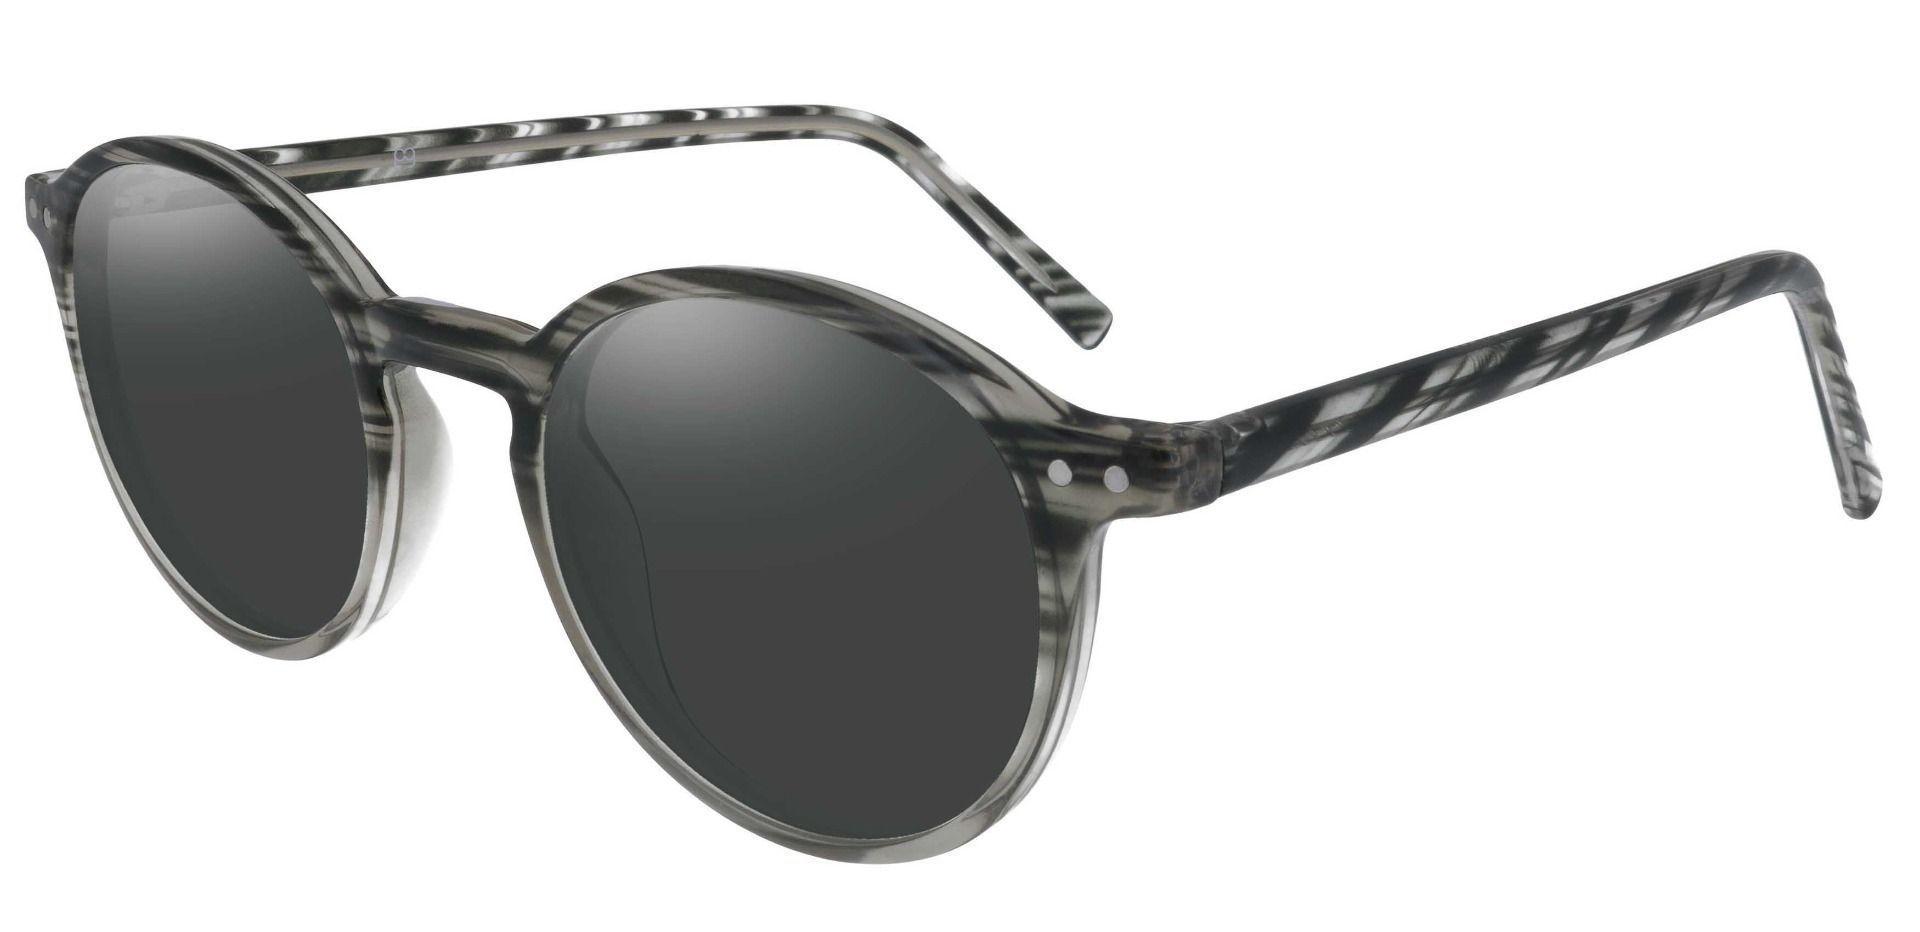 Harvard Round Prescription Sunglasses - Striped Frame With Gray Lenses